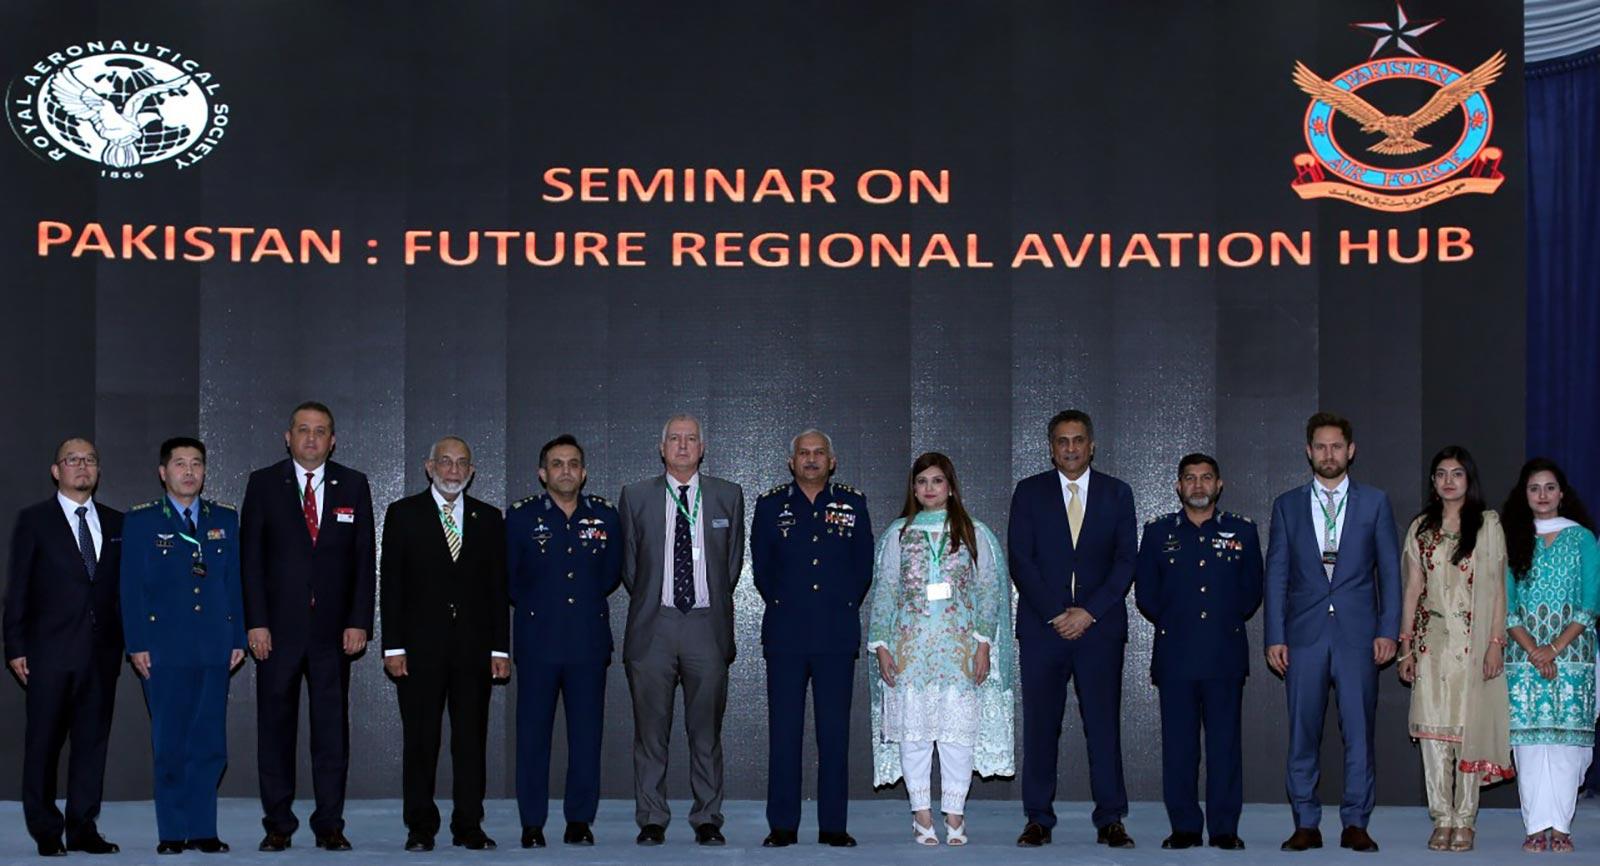 Pakistan Air Force (PAF) The Future Regional Aviation Hub